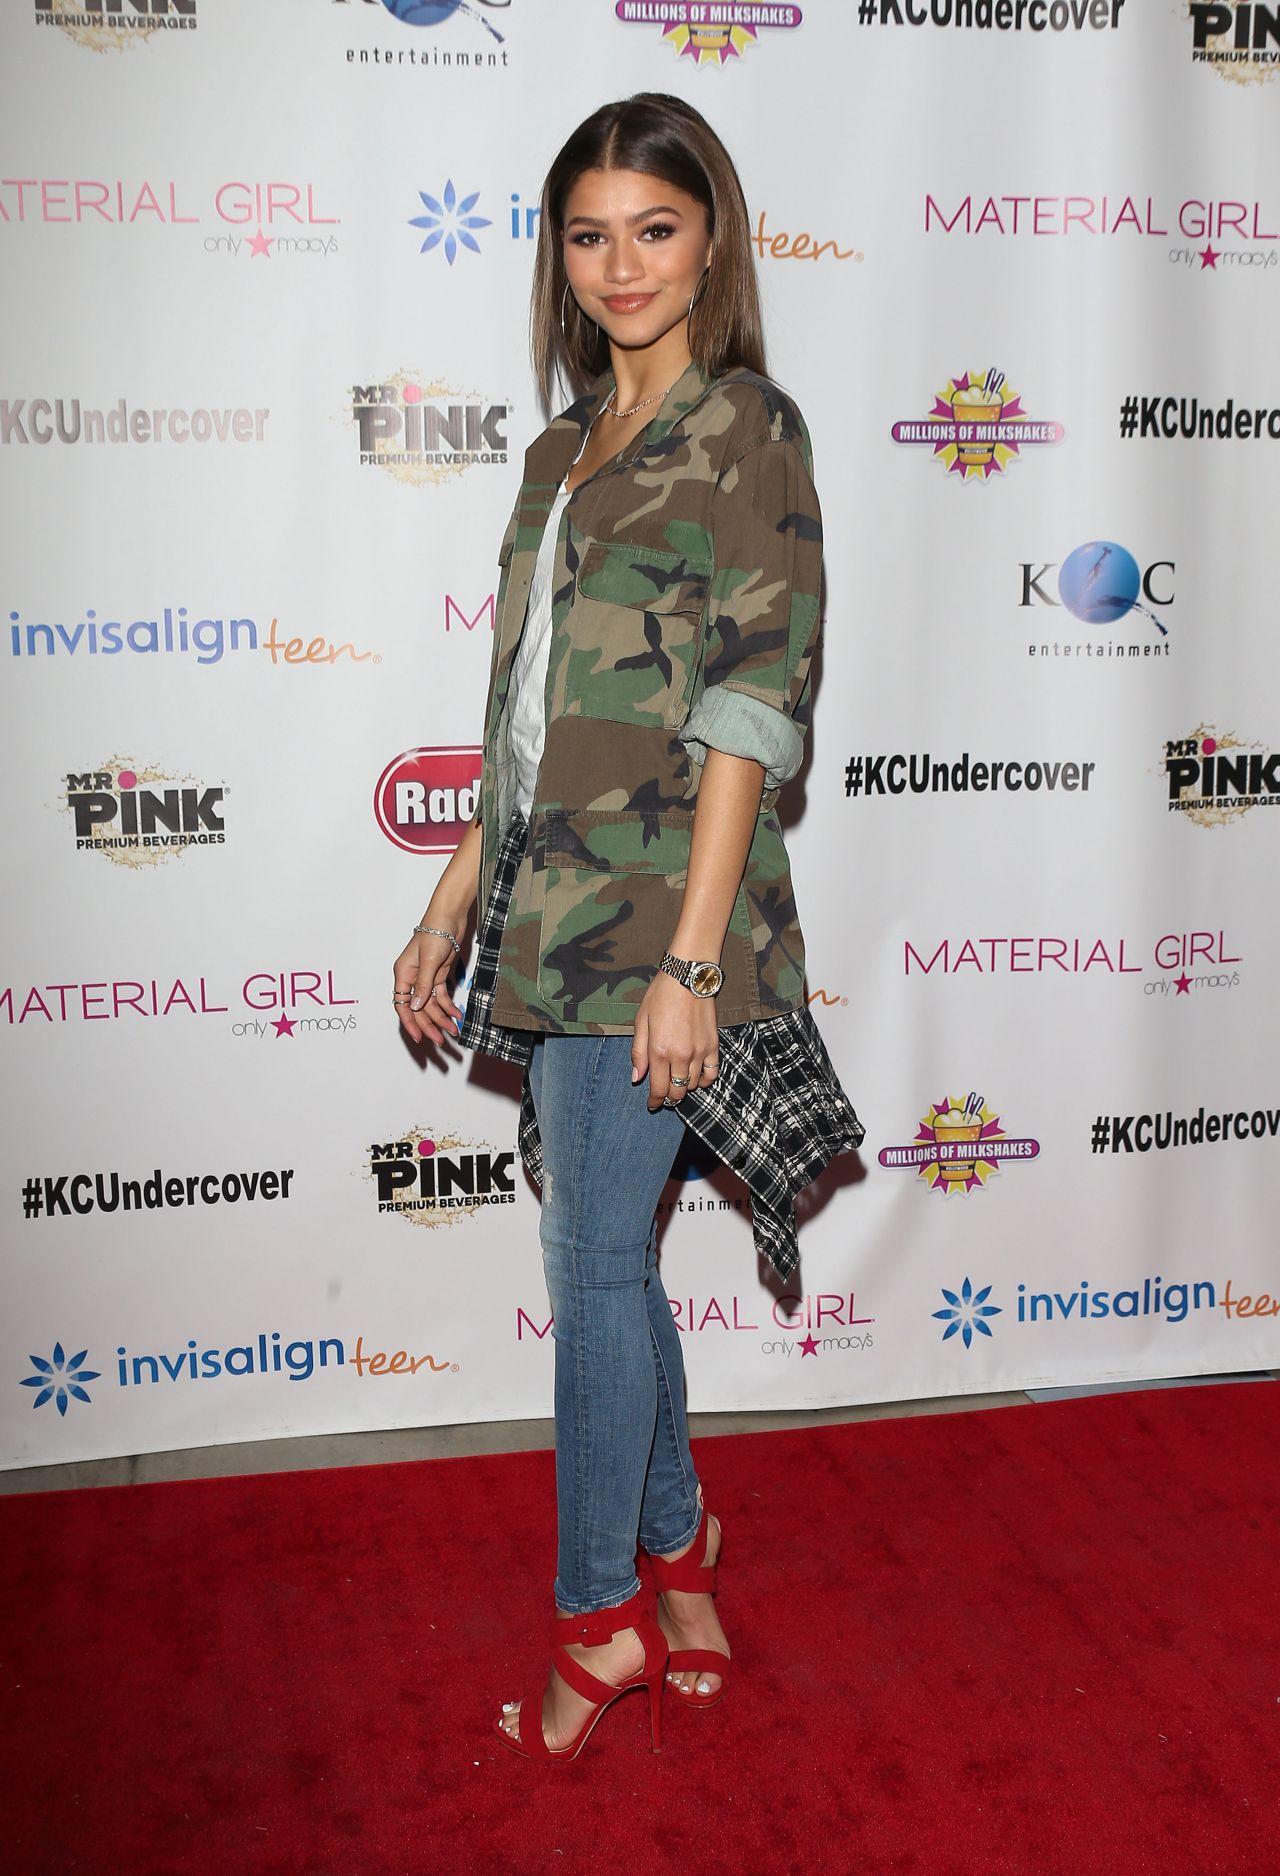 Zendaya Coleman K C Undercover Premier Party In Hollywood